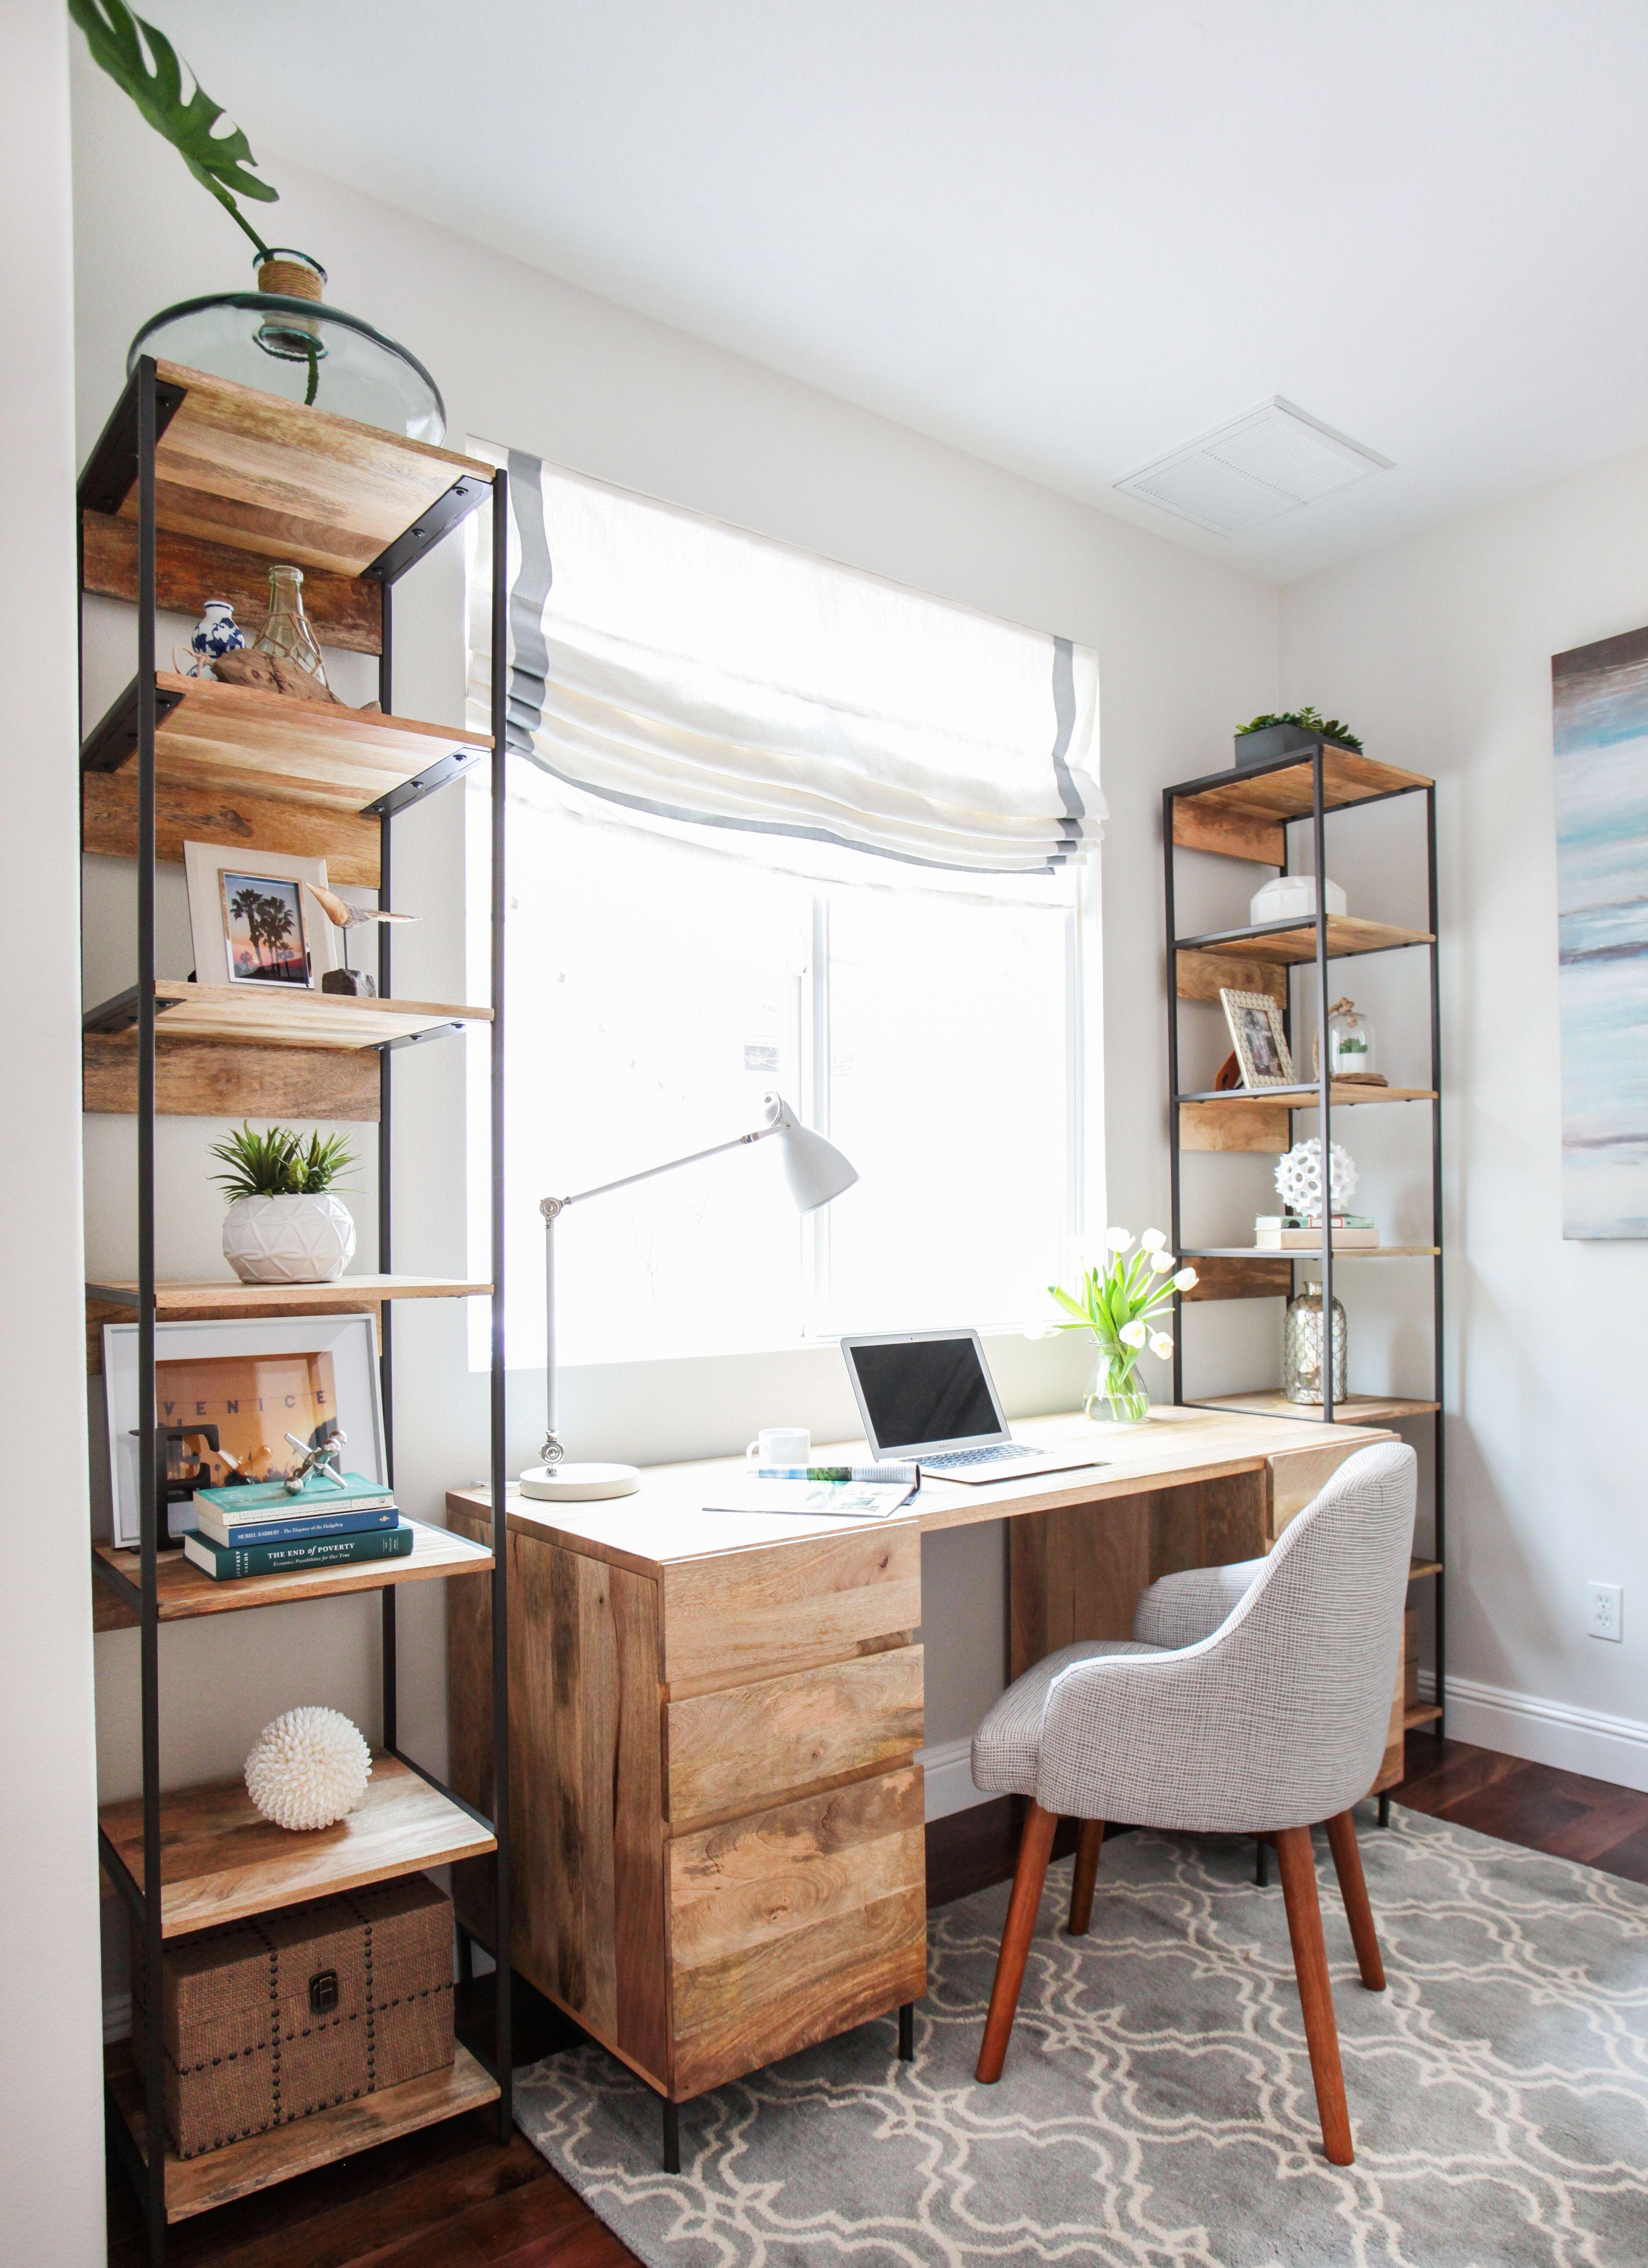 Beachy Office Bright West Elm Beach Wood Desk And Shelves Coastal Retreat